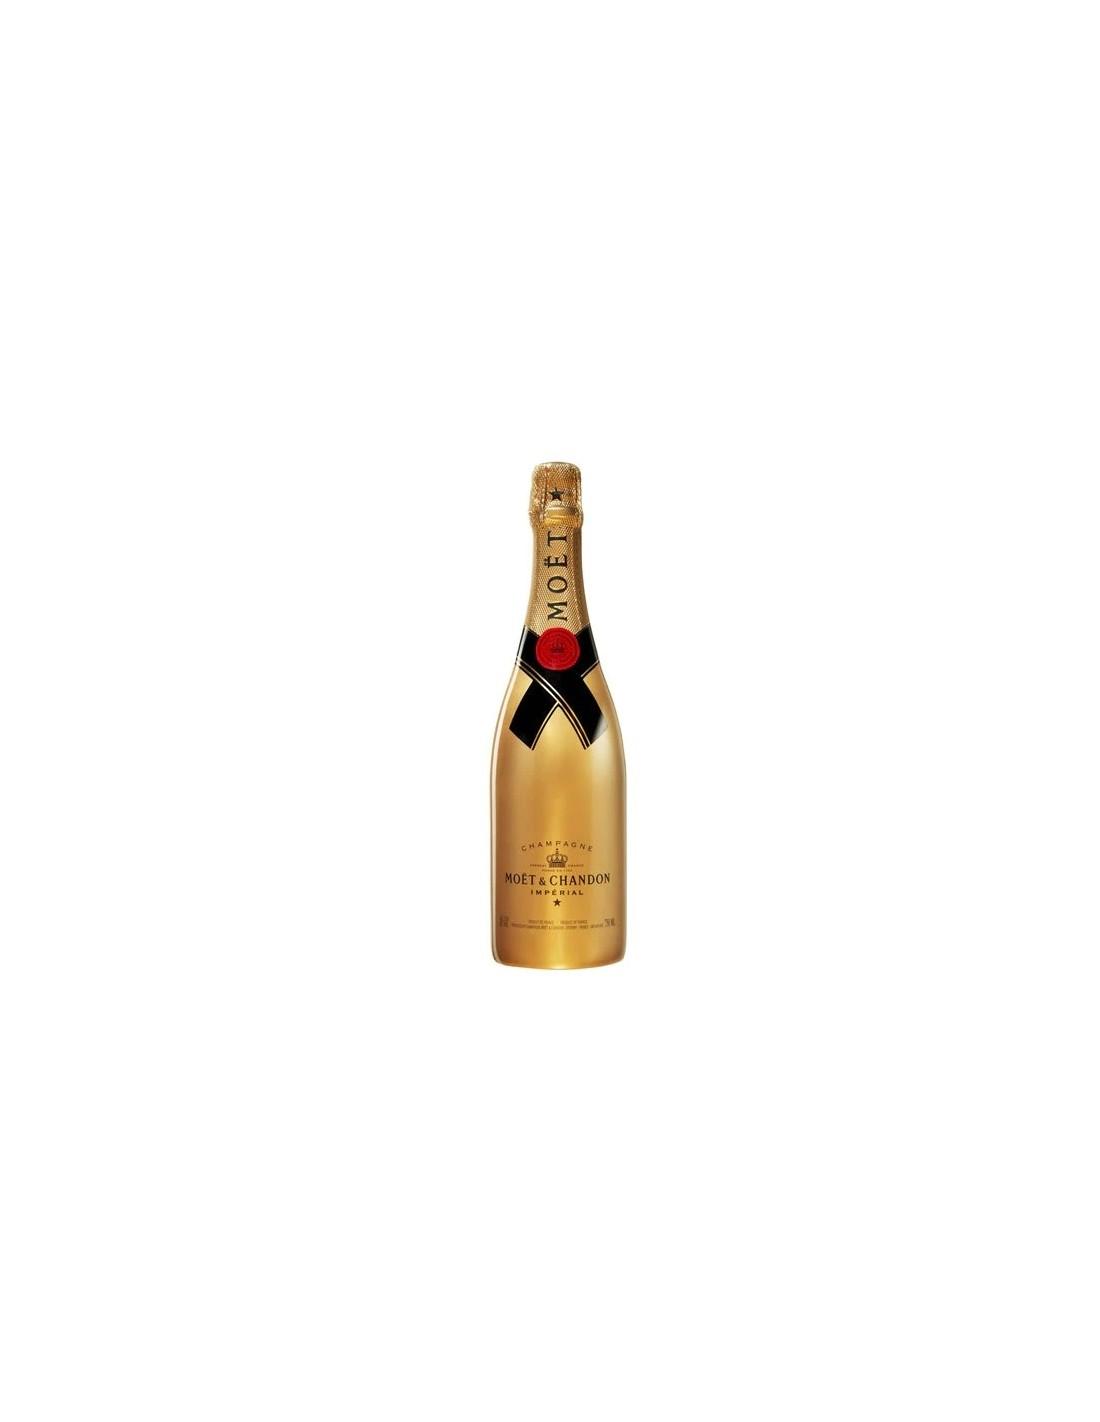 Sampanie Moët & Chandon Gold Brut Impérial Champagne, 0.75L, 12% alc., Franta